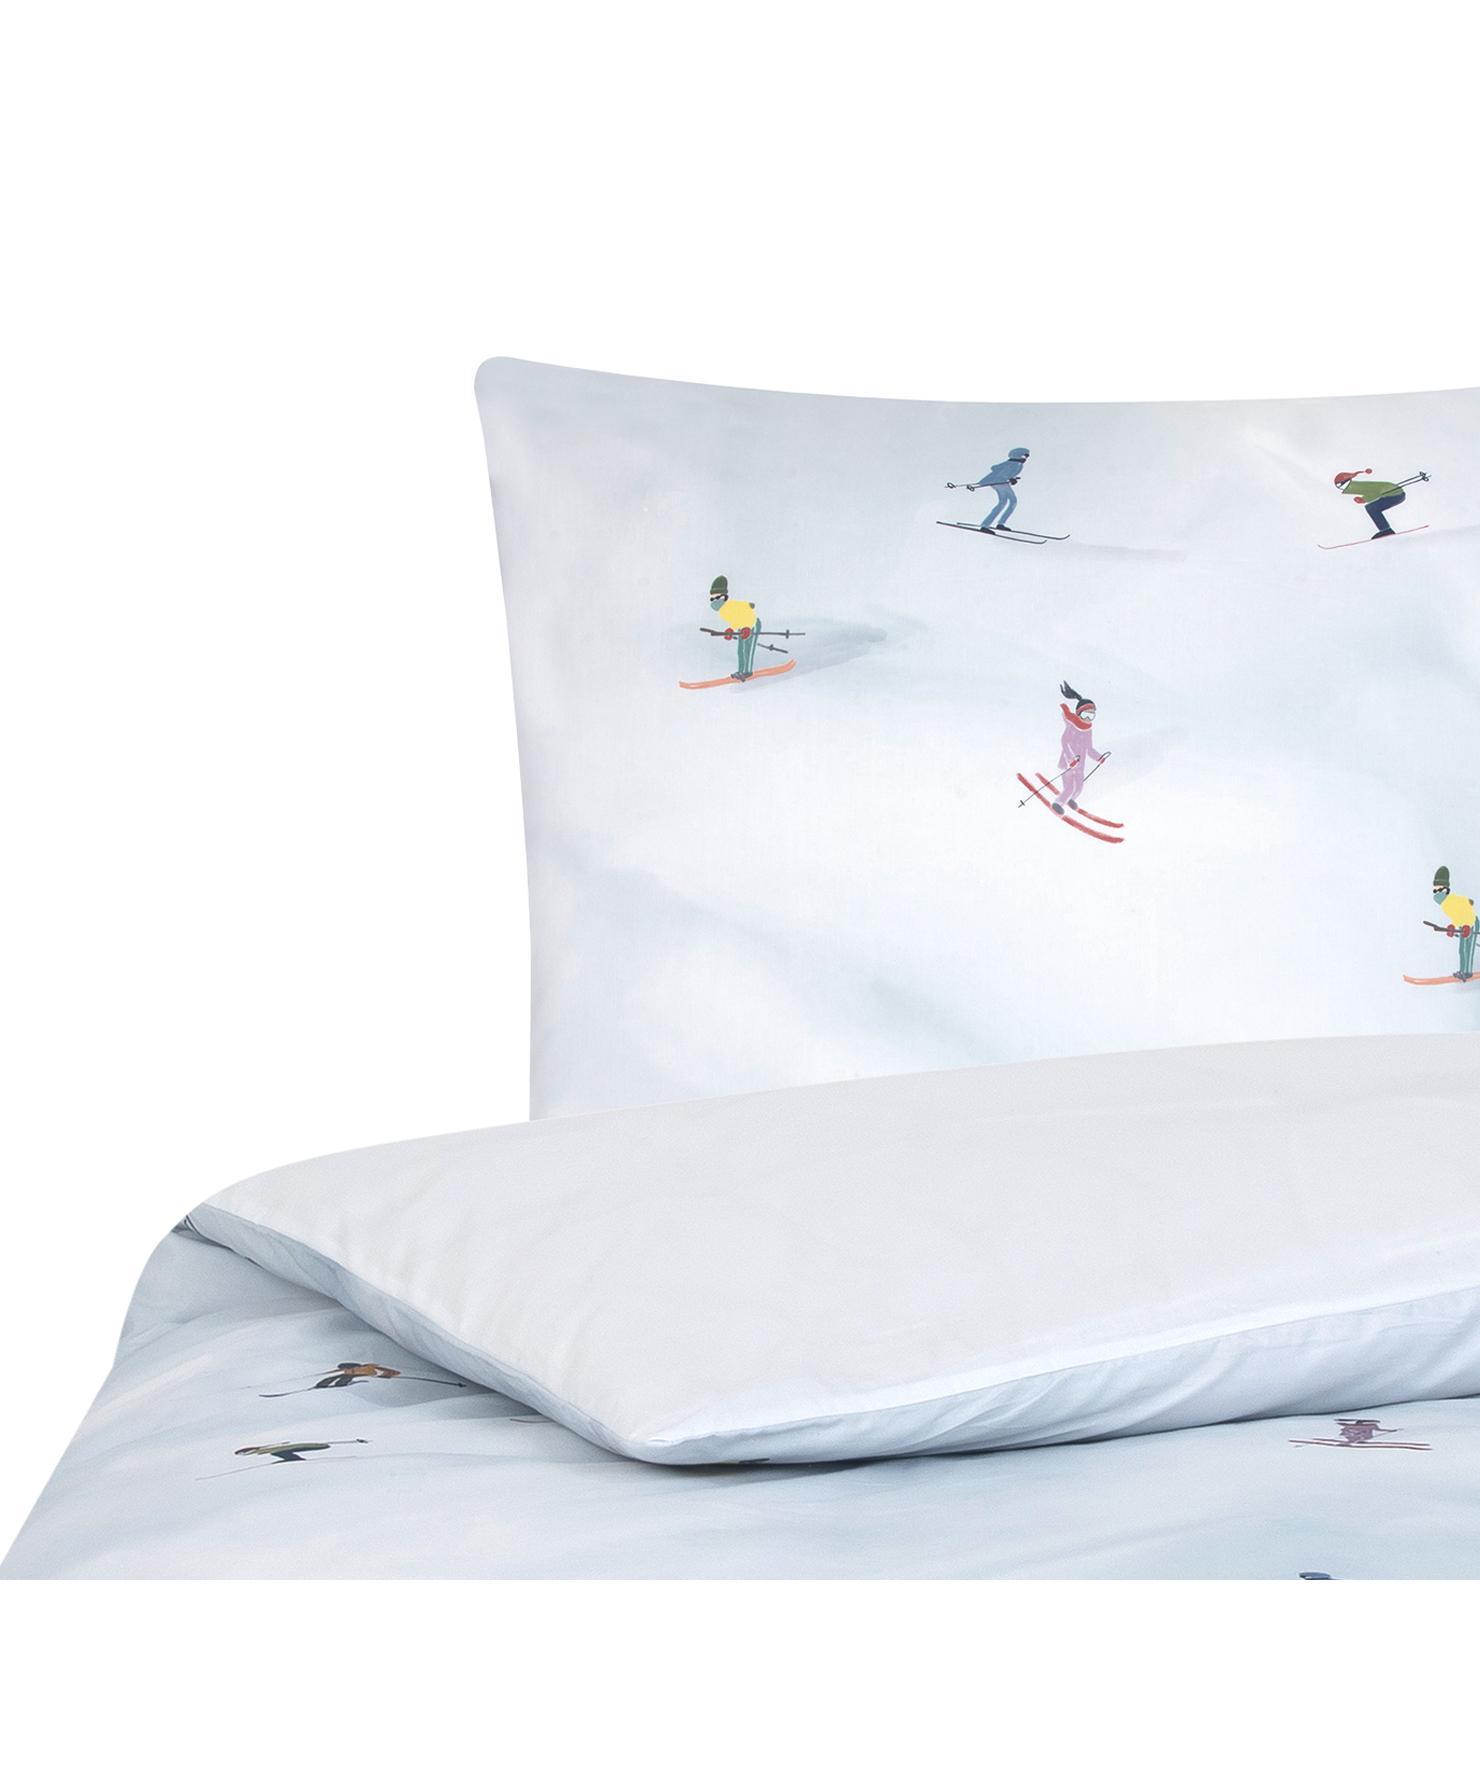 Designer Baumwollperkal-Bettwäsche Ski von Kera Till, Webart: Perkal, Weiß, Mehrfarbig, 135 x 200 cm + 1 Kissen 80 x 80 cm